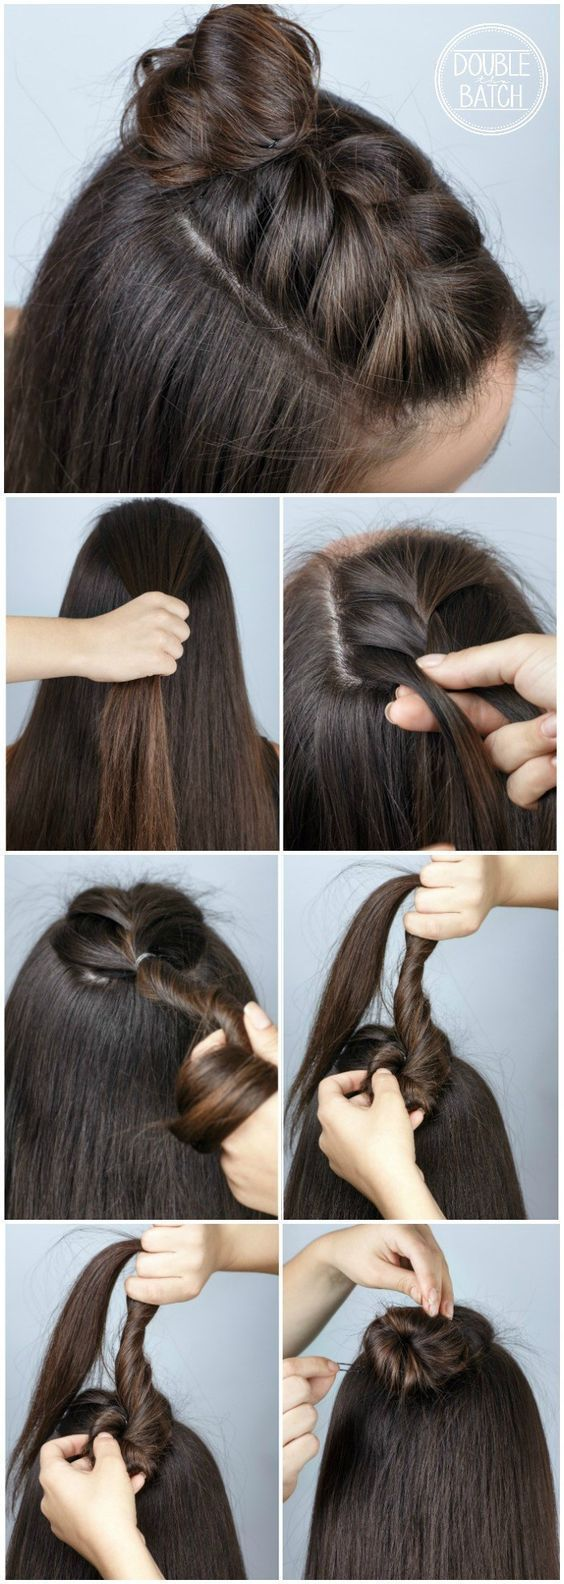 Photo of Half Braid Tutorial + Video Haarschnitt Tutorial enthalten, #Braid #included #haircut #Tutorial …